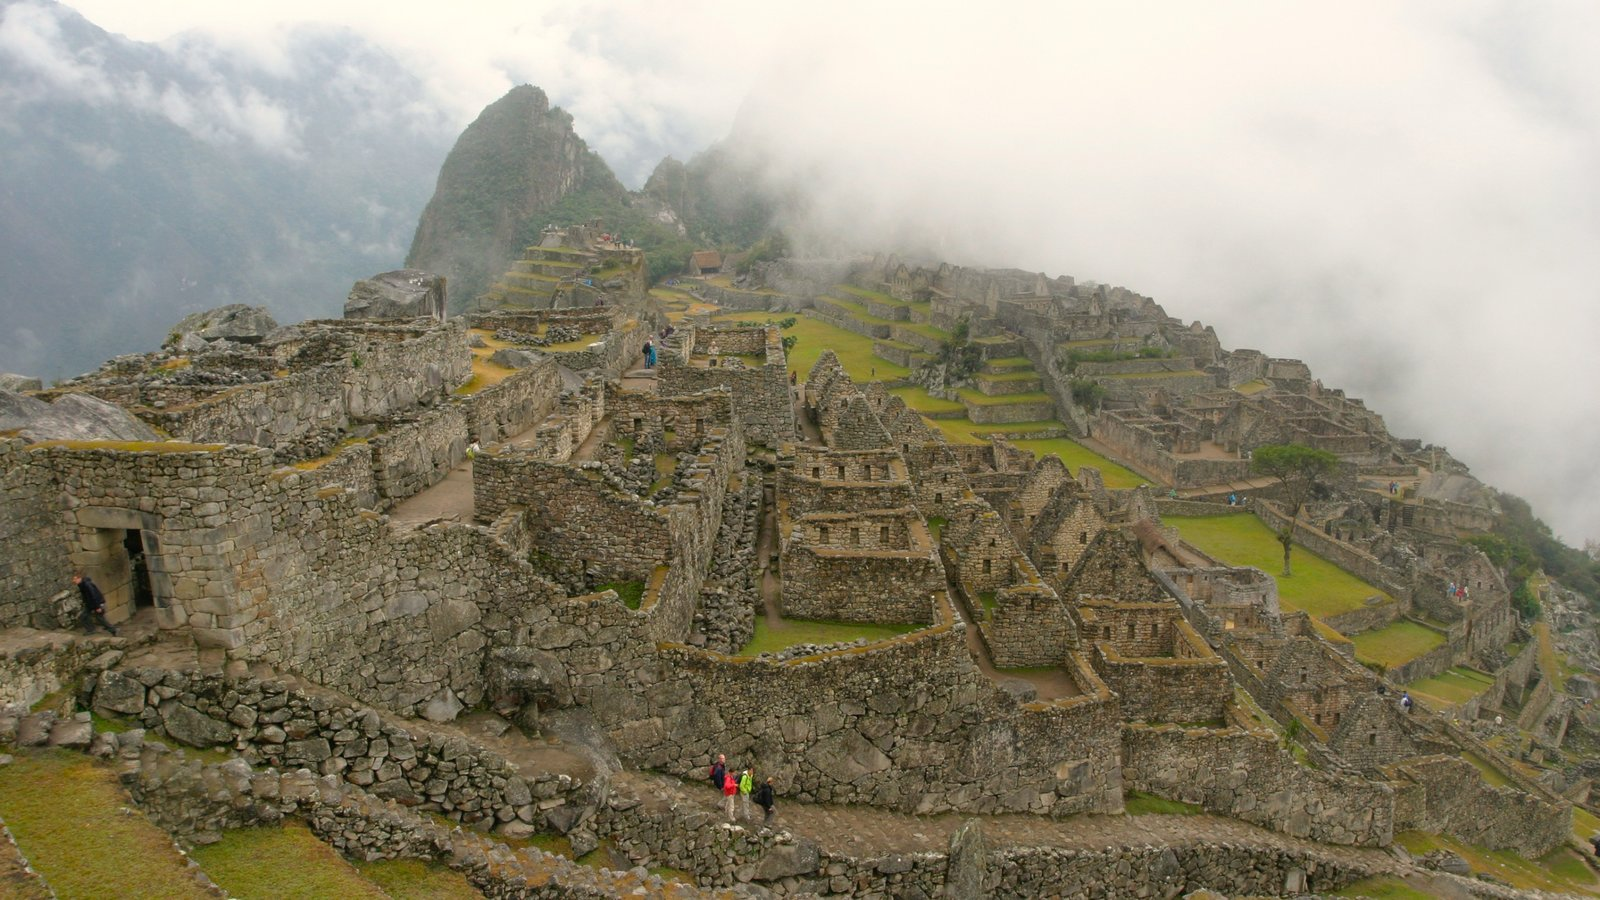 Machu Picchu caracterizando ruínas de edifício, montanhas e neblina